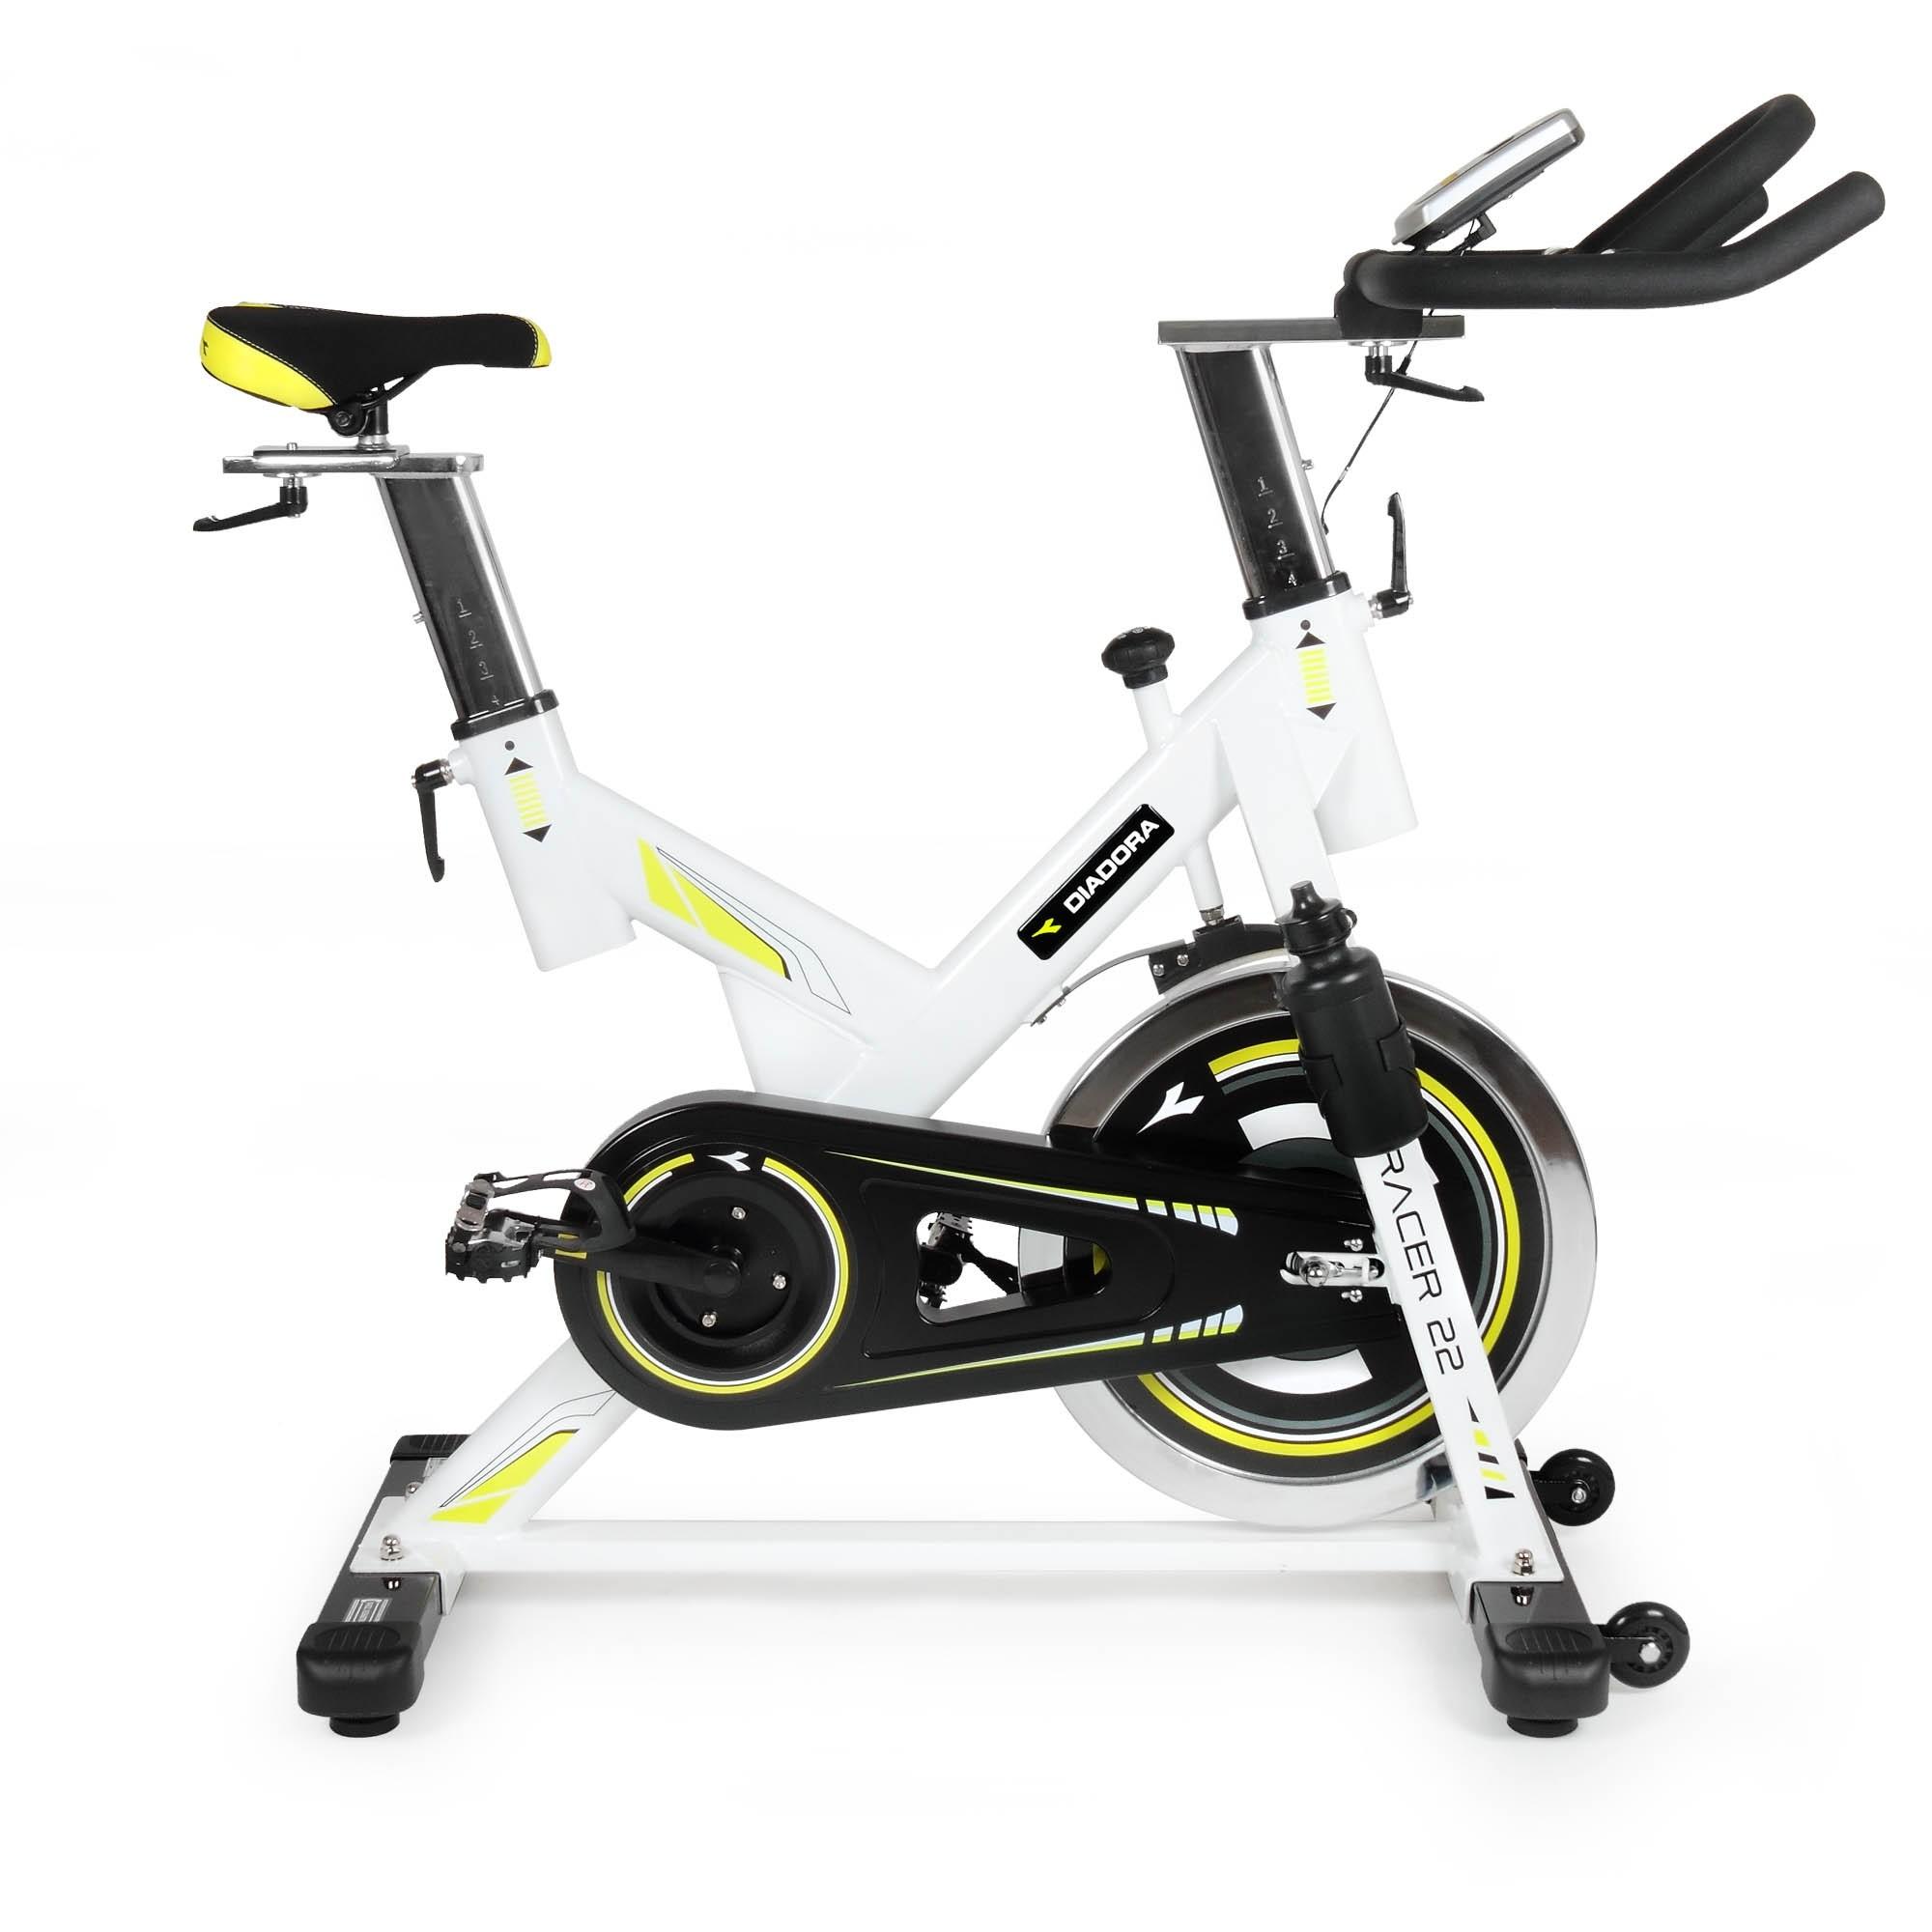 Diadora Racer 22 | Opinioni e Prezzi | BiciSpinningBike.it